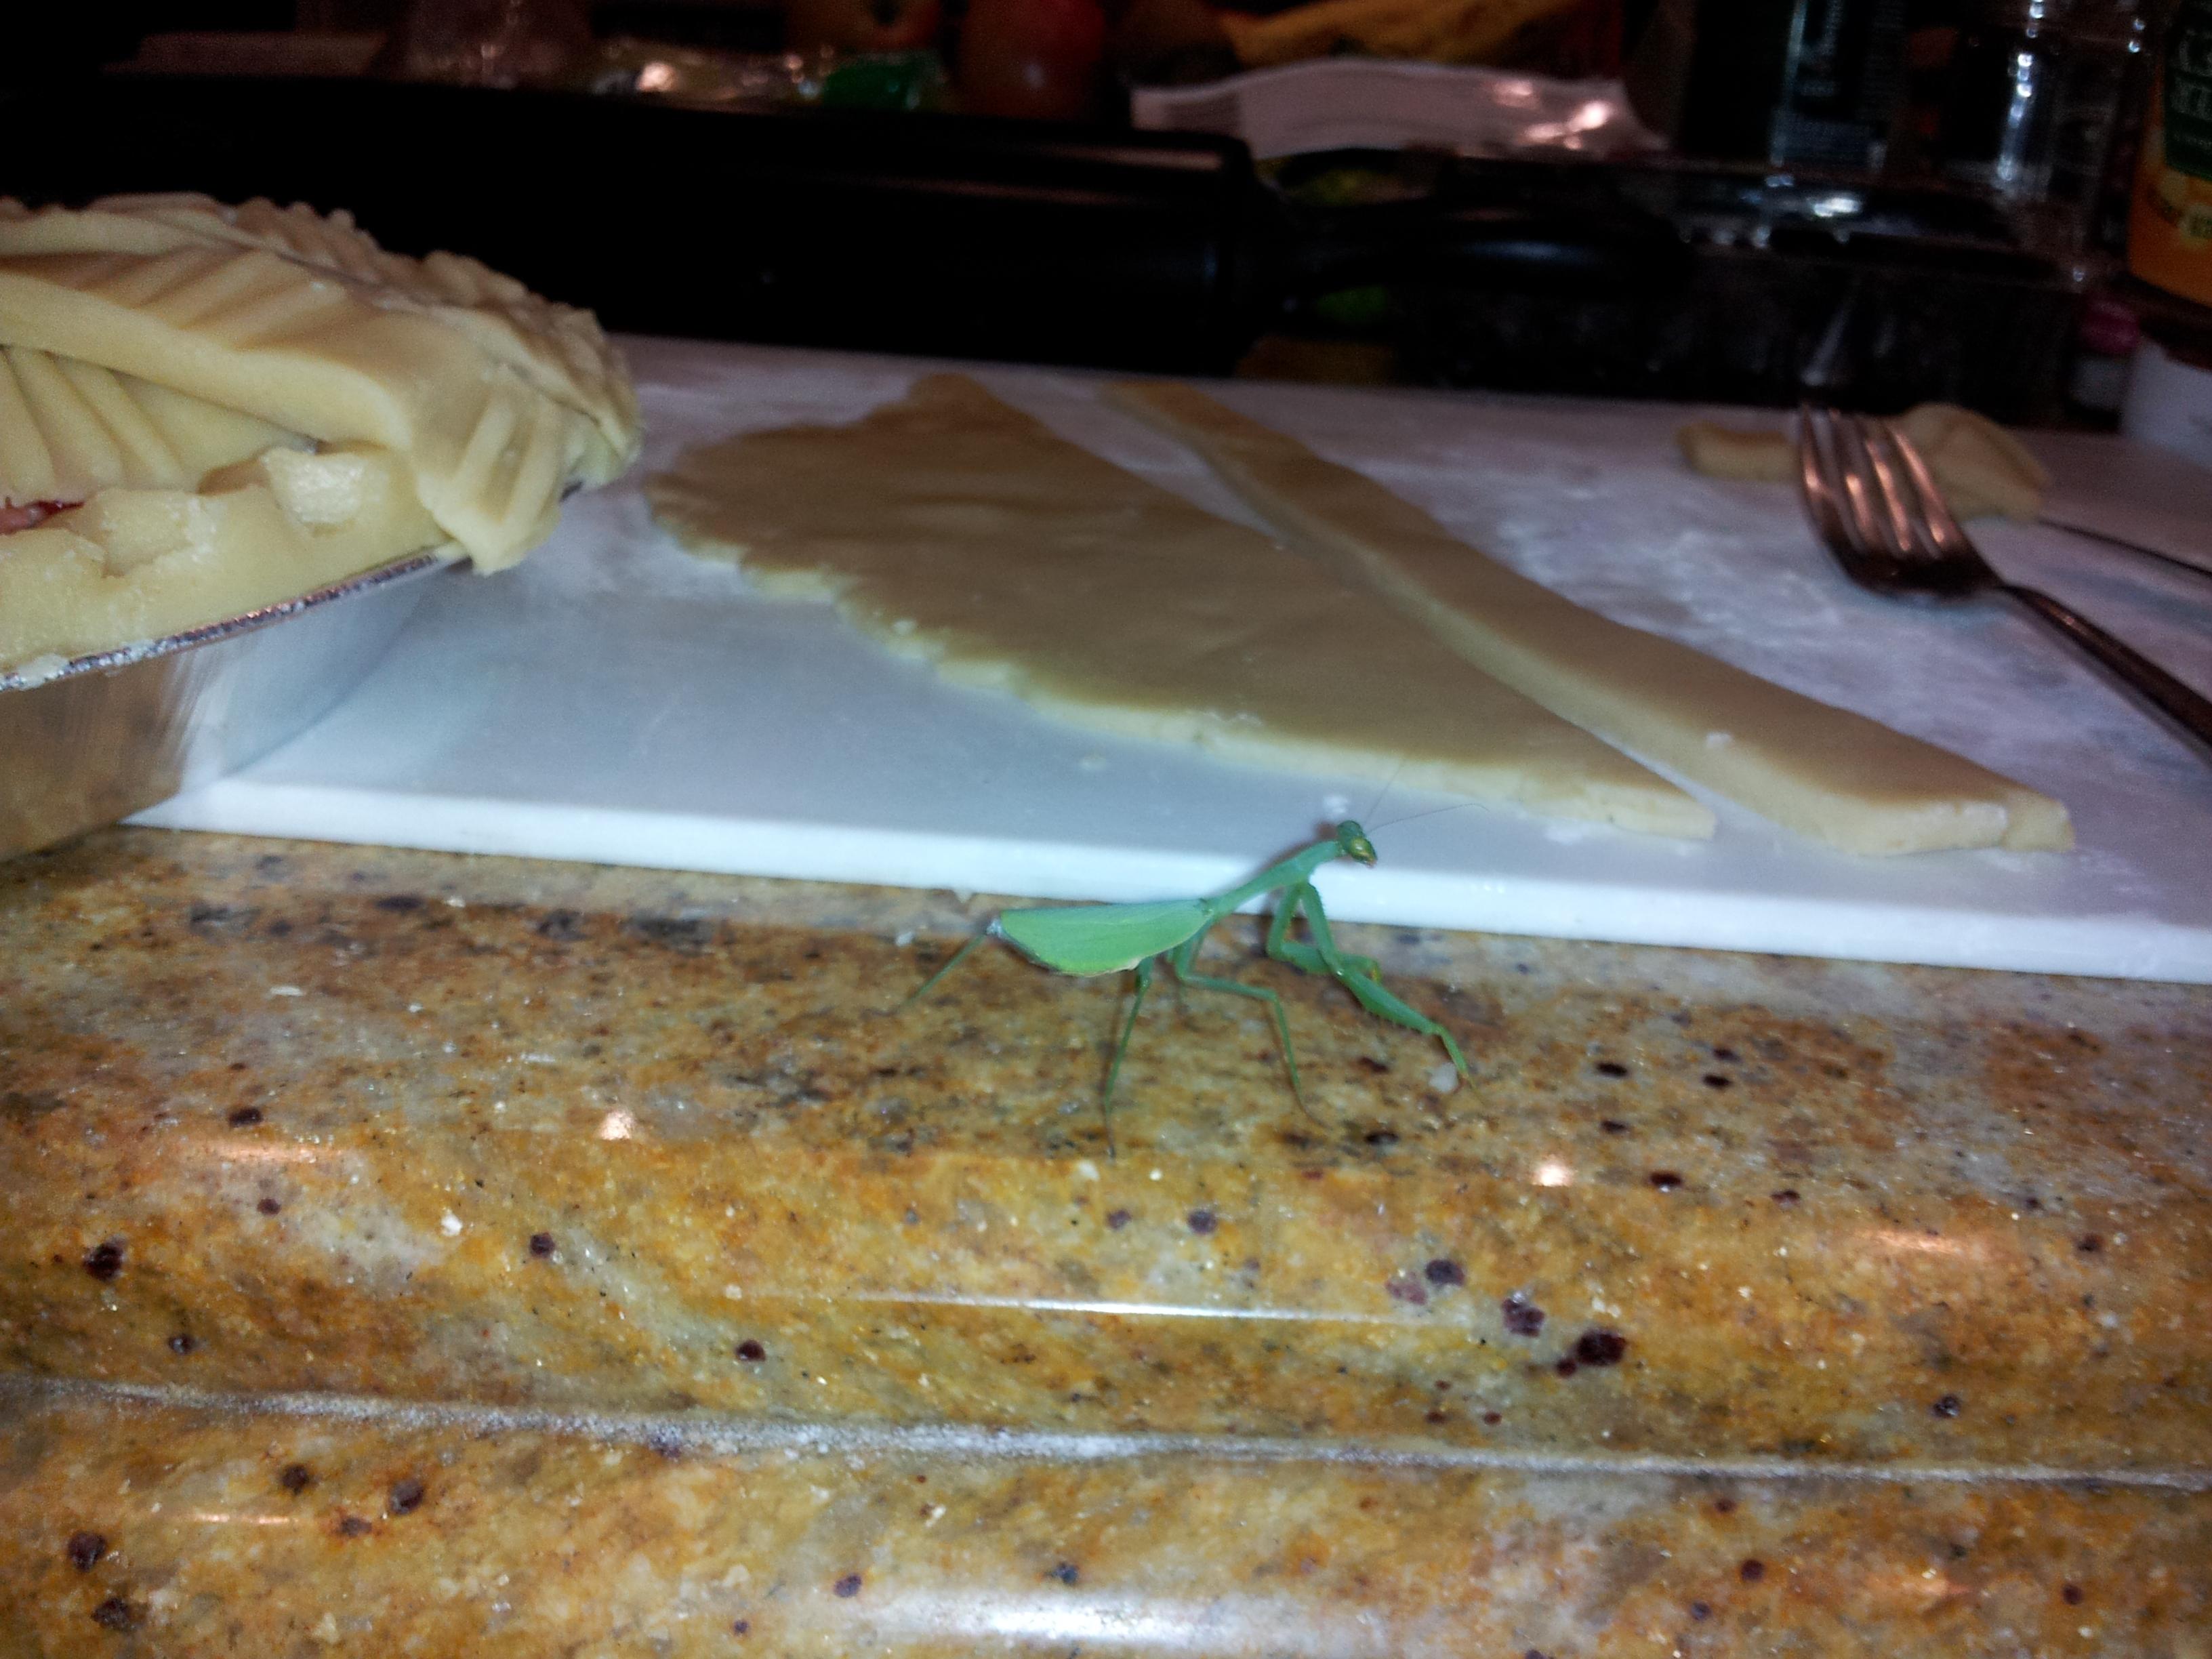 Praying mantis sends a message navigating vita by biocorpaavc